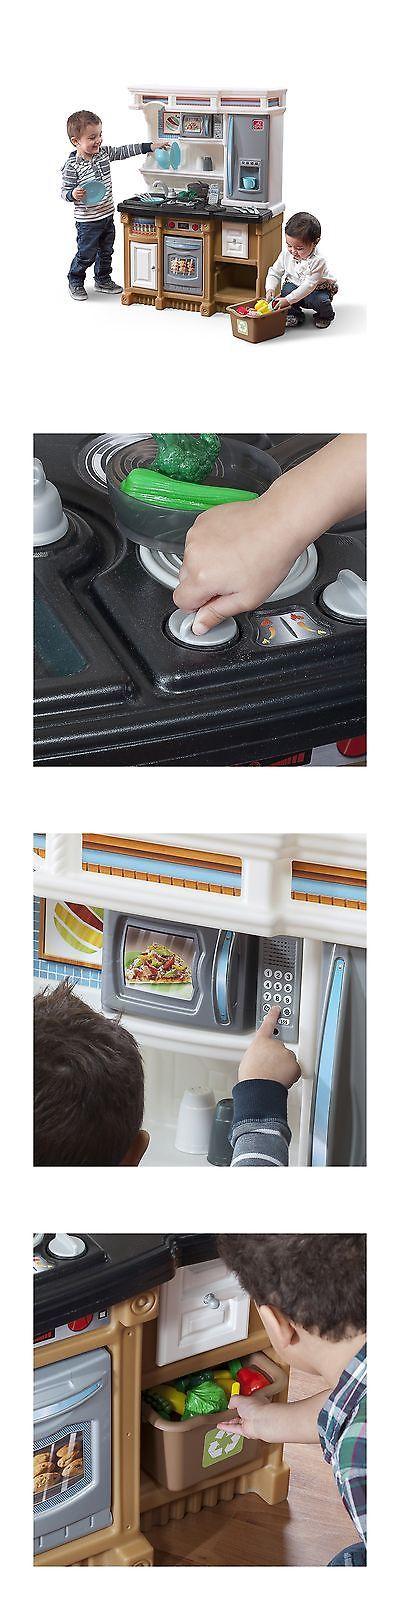 Kitchens 158746: Step2 Lifestyle Custom Kitchen Playset -> BUY IT NOW ONLY: $99.23 on eBay!